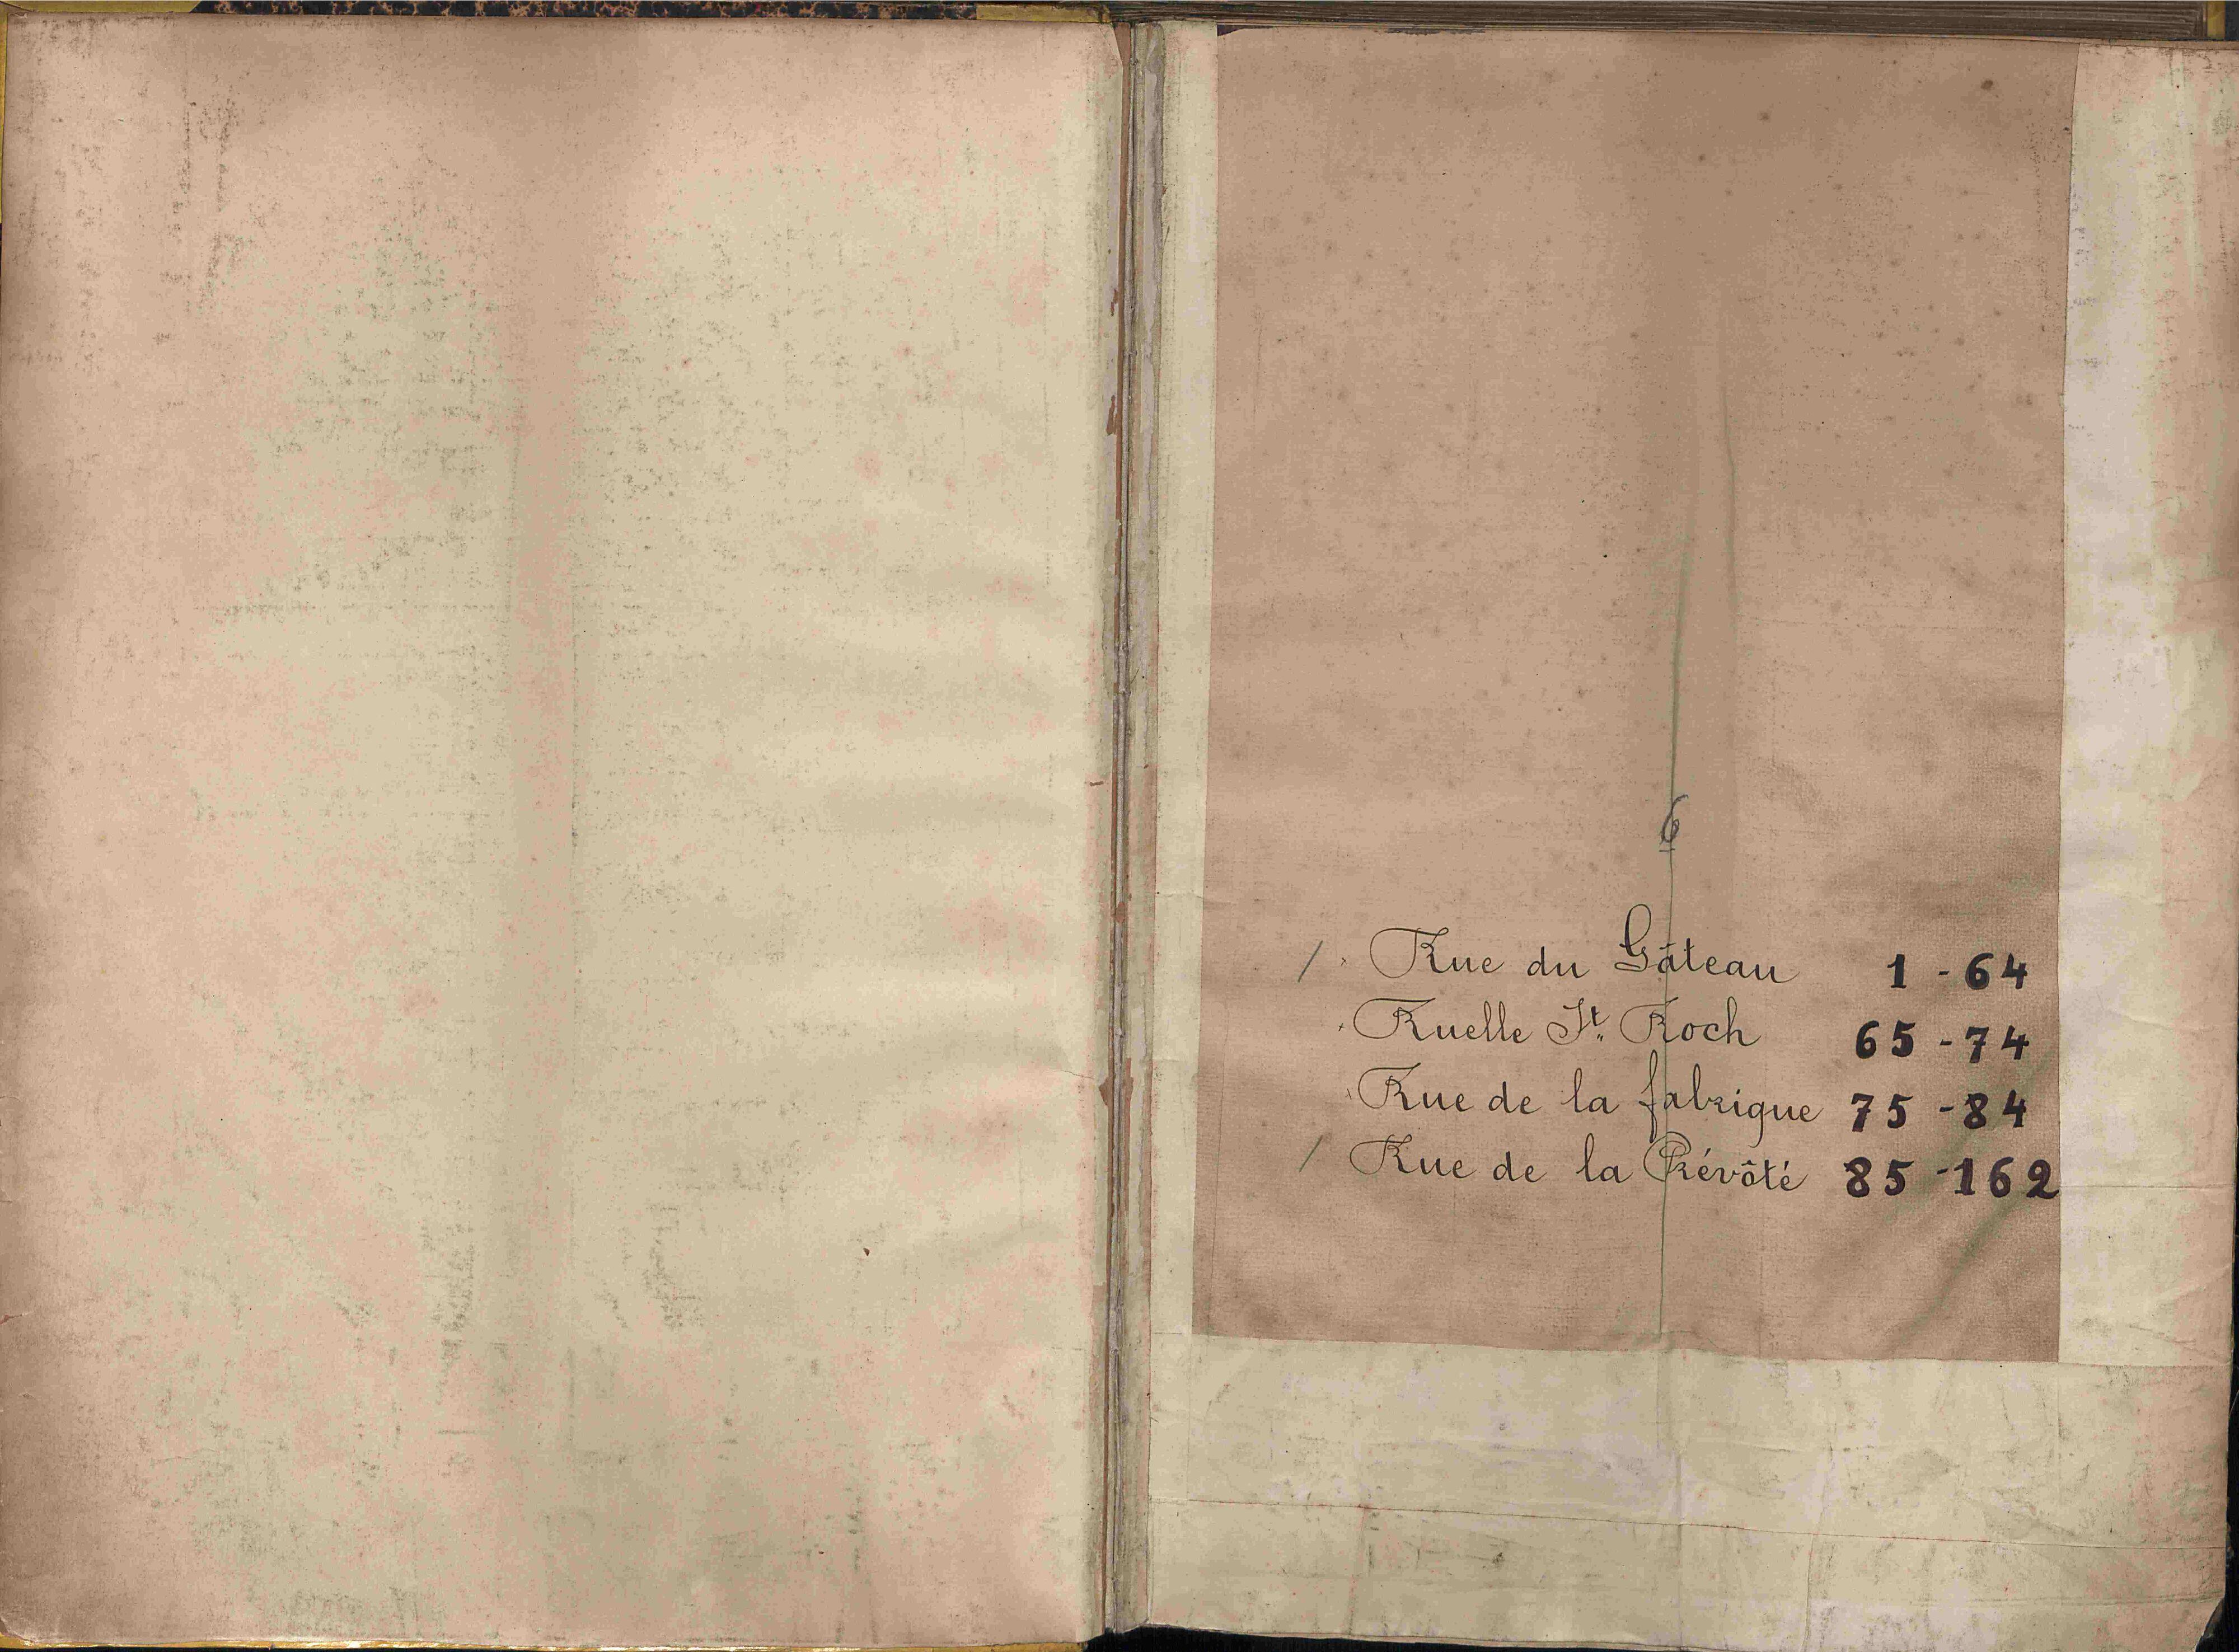 Bevolkingsregister Kortrijk 1890 boek 6